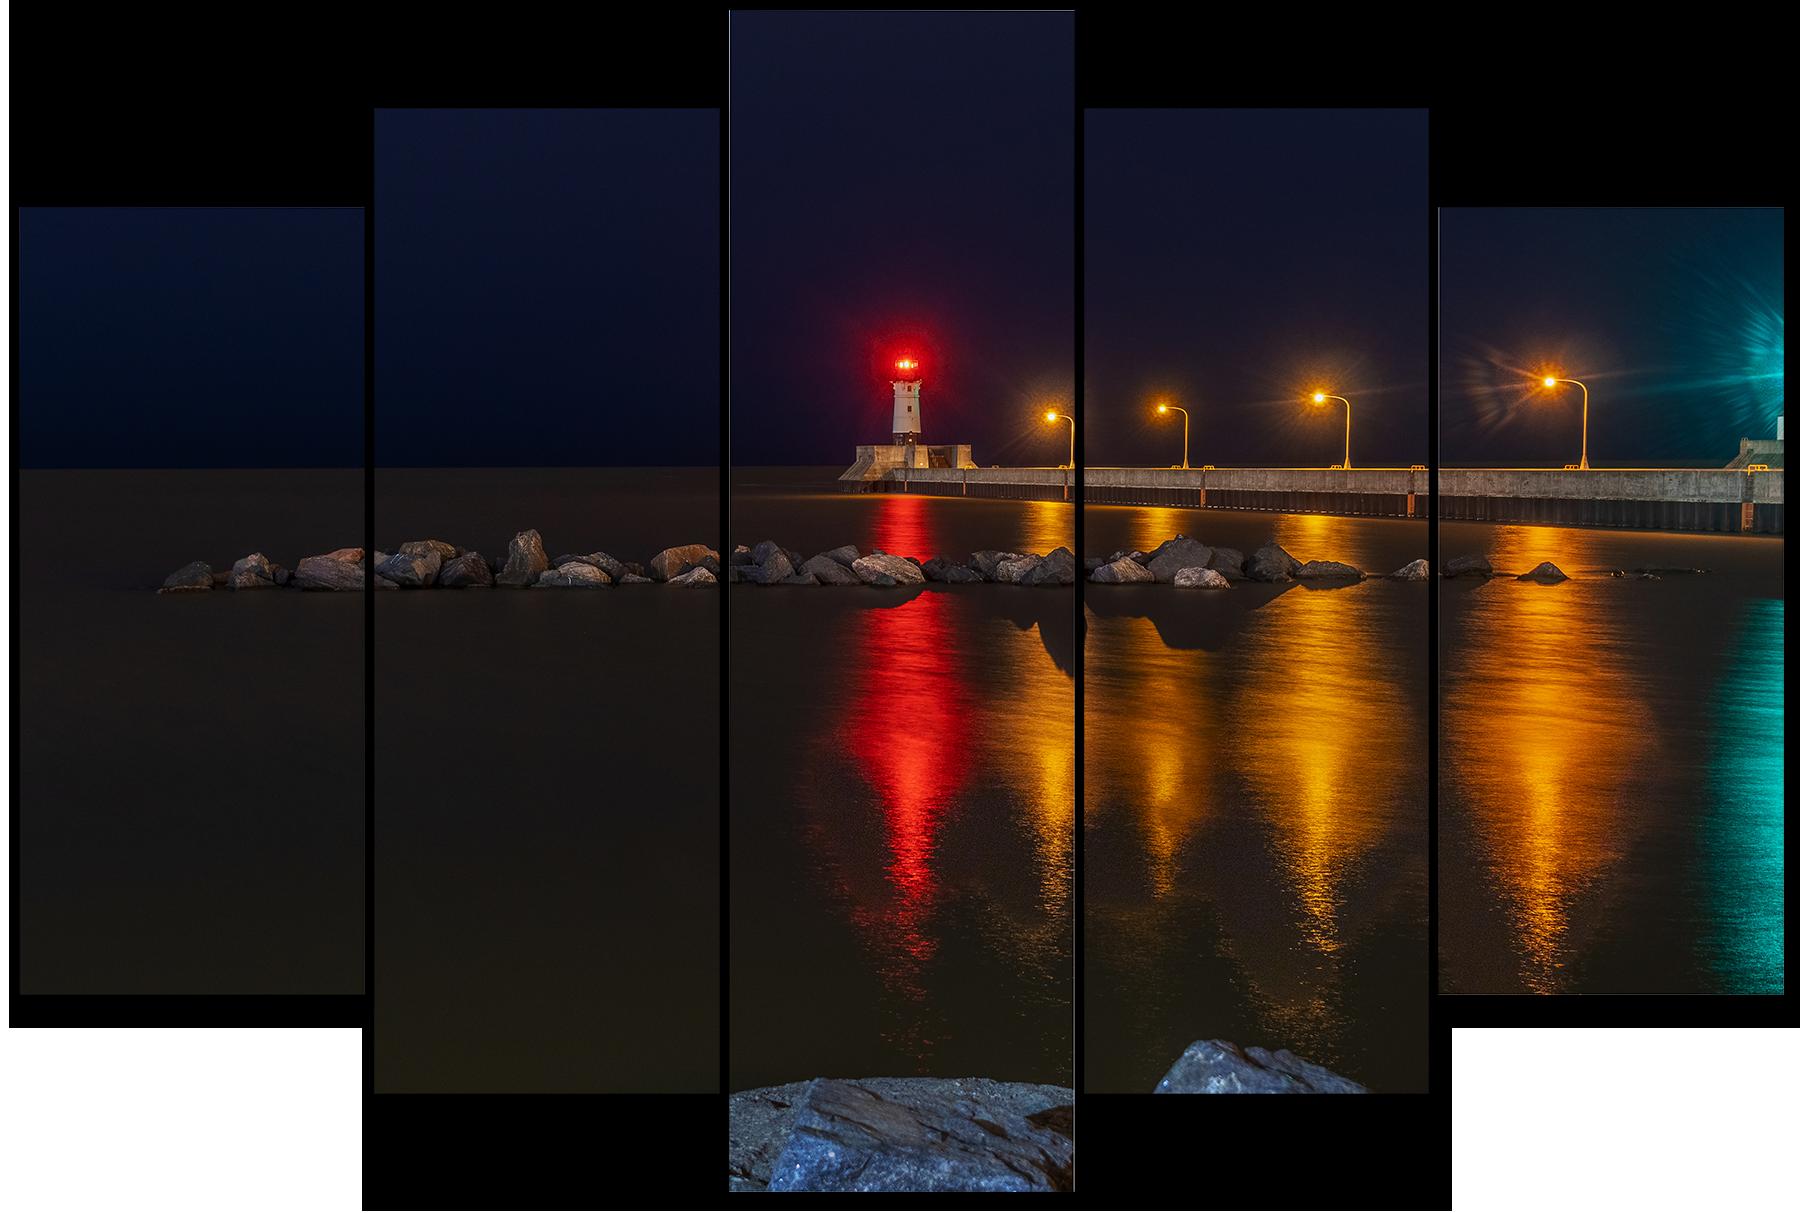 Duluth north pier lighthouse cmr3qb